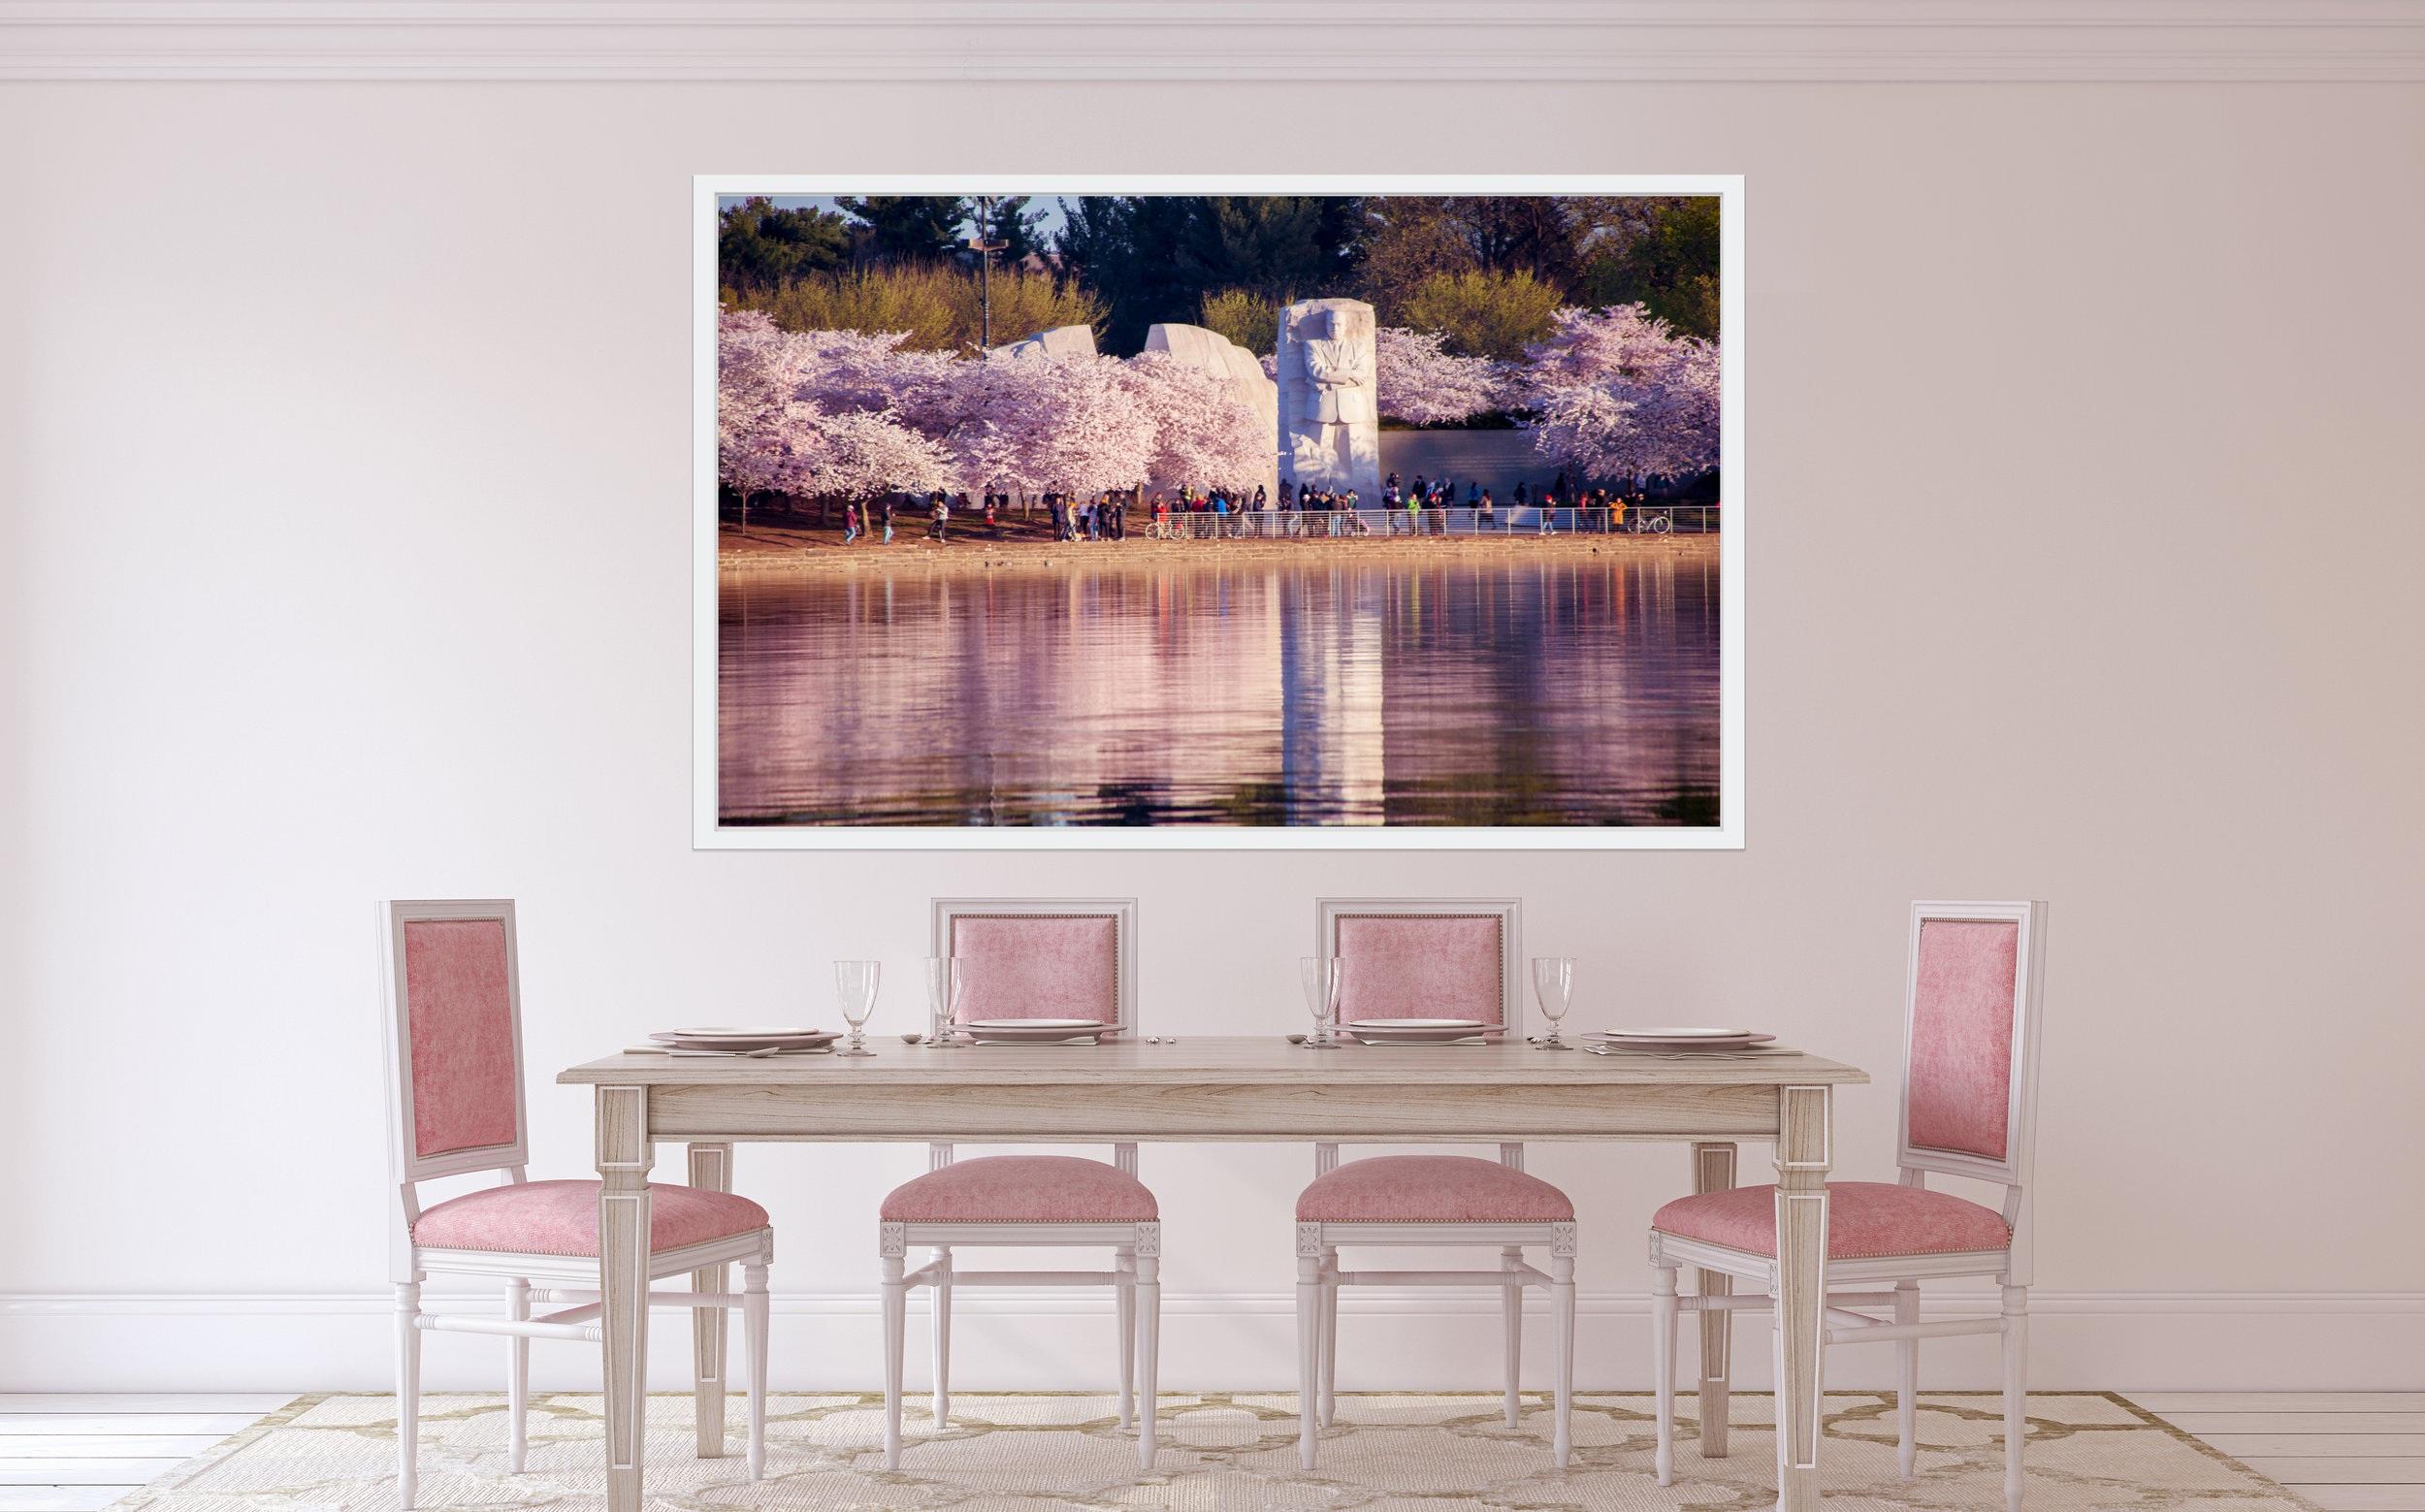 10*MLK Jr CB Sunrise Dining Room Sample.jpg